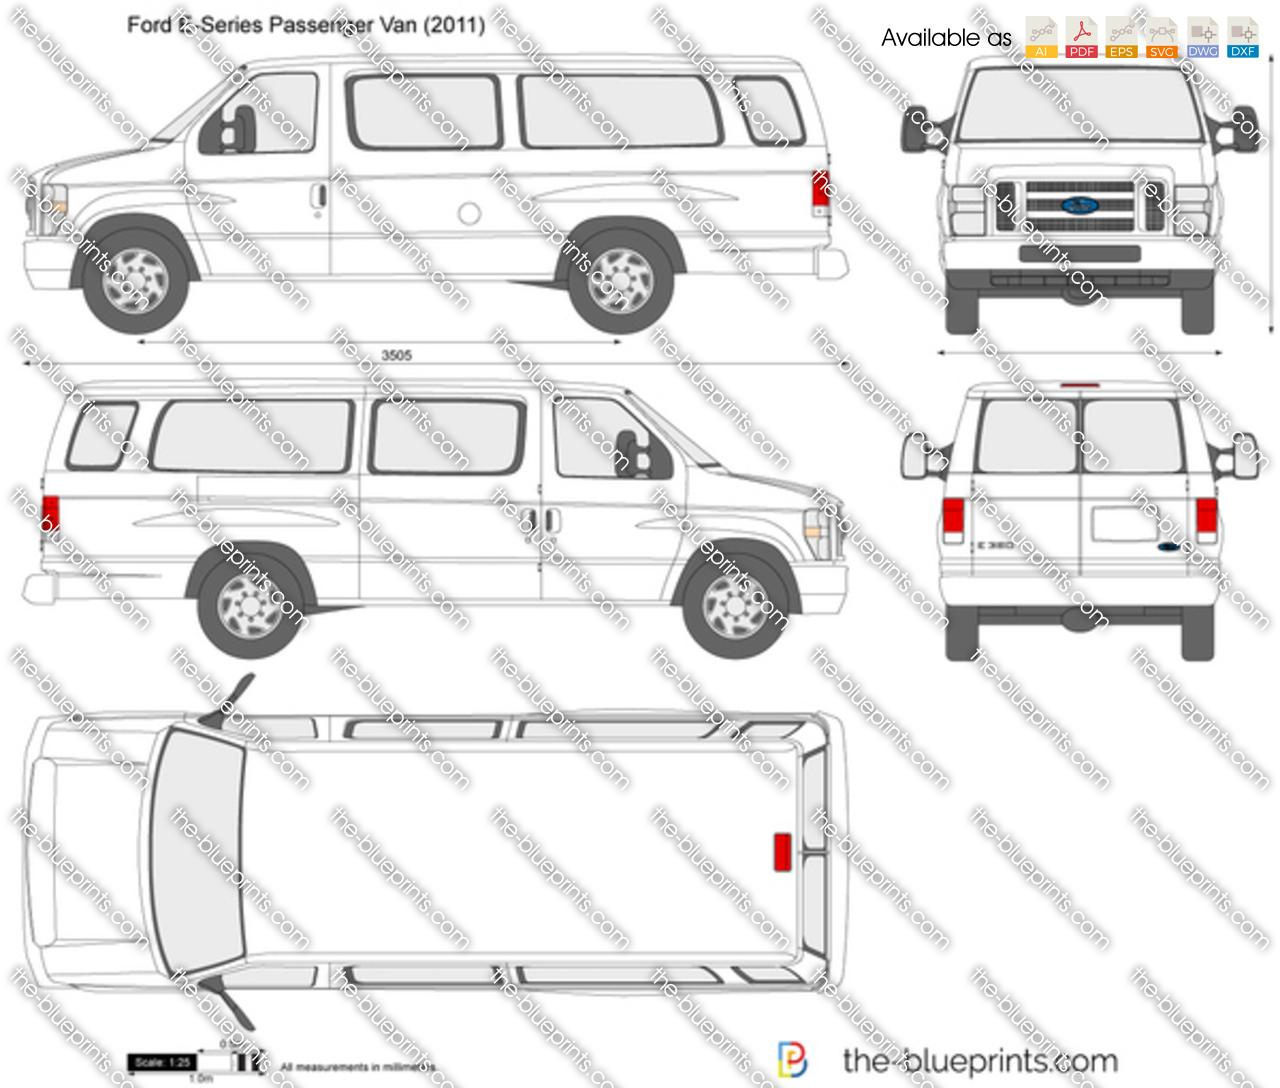 Ford E Series Passenger Van Vector Drawing